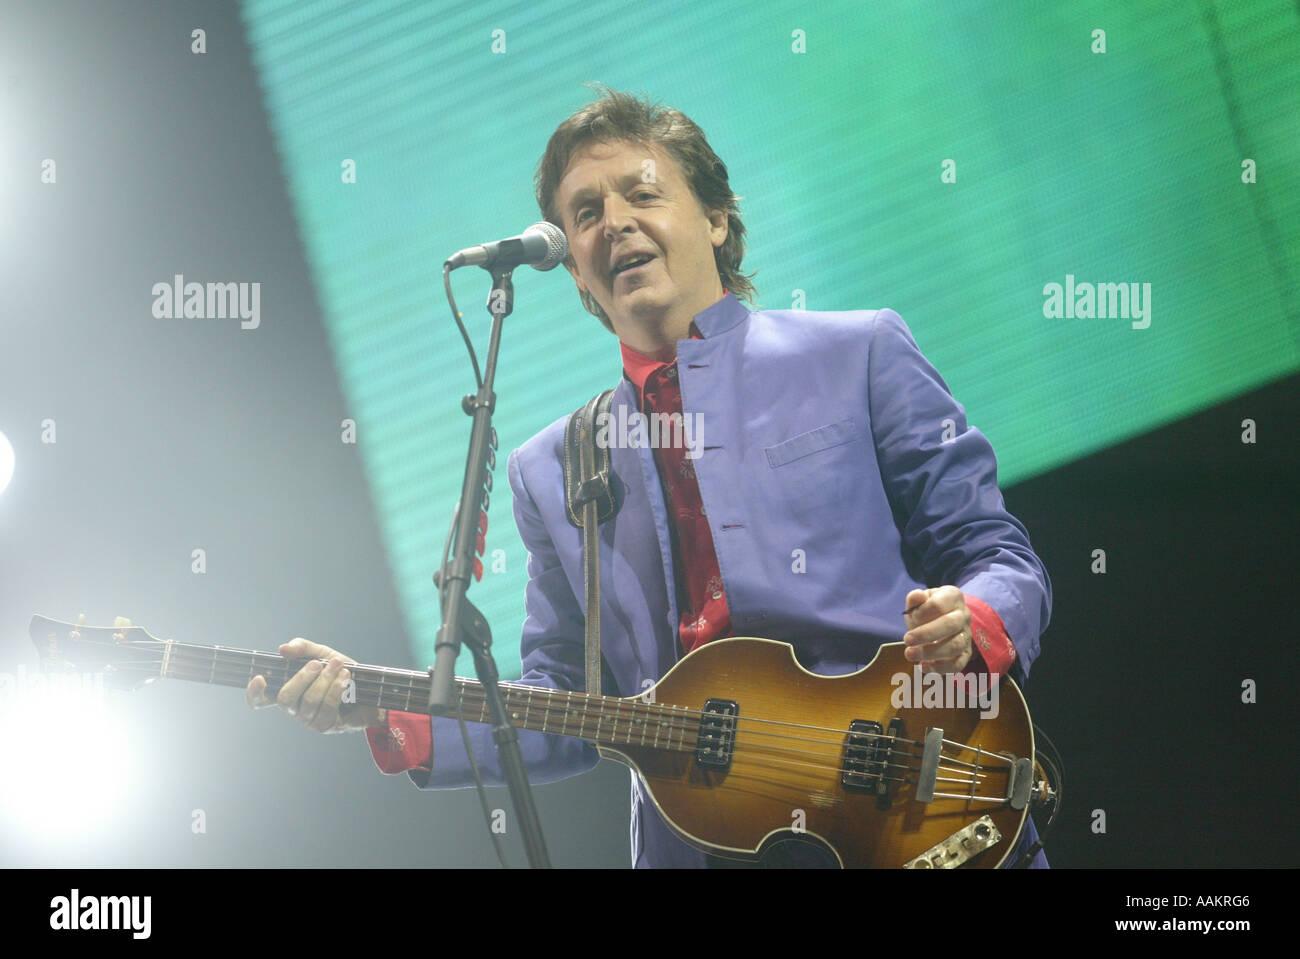 Paul McCartney  performs at the Glastonbury Festival, England, June 2004. - Stock Image